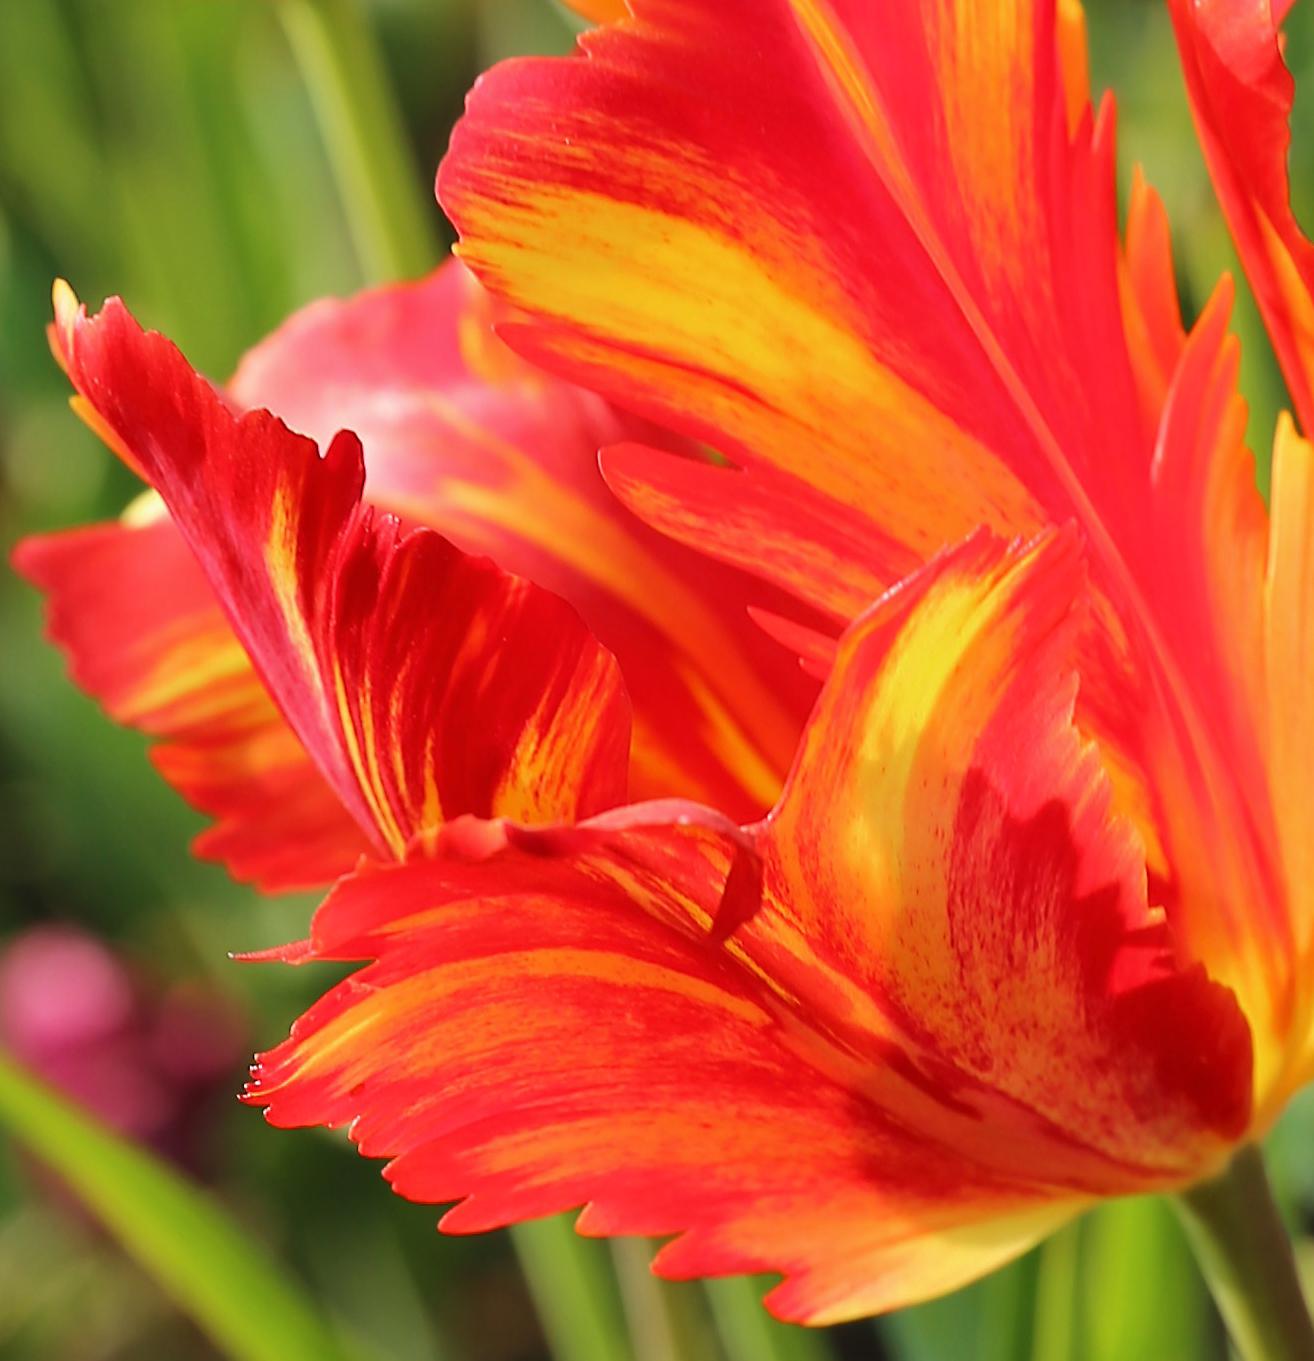 Fire tulip dancing orange and red beautiful pretty